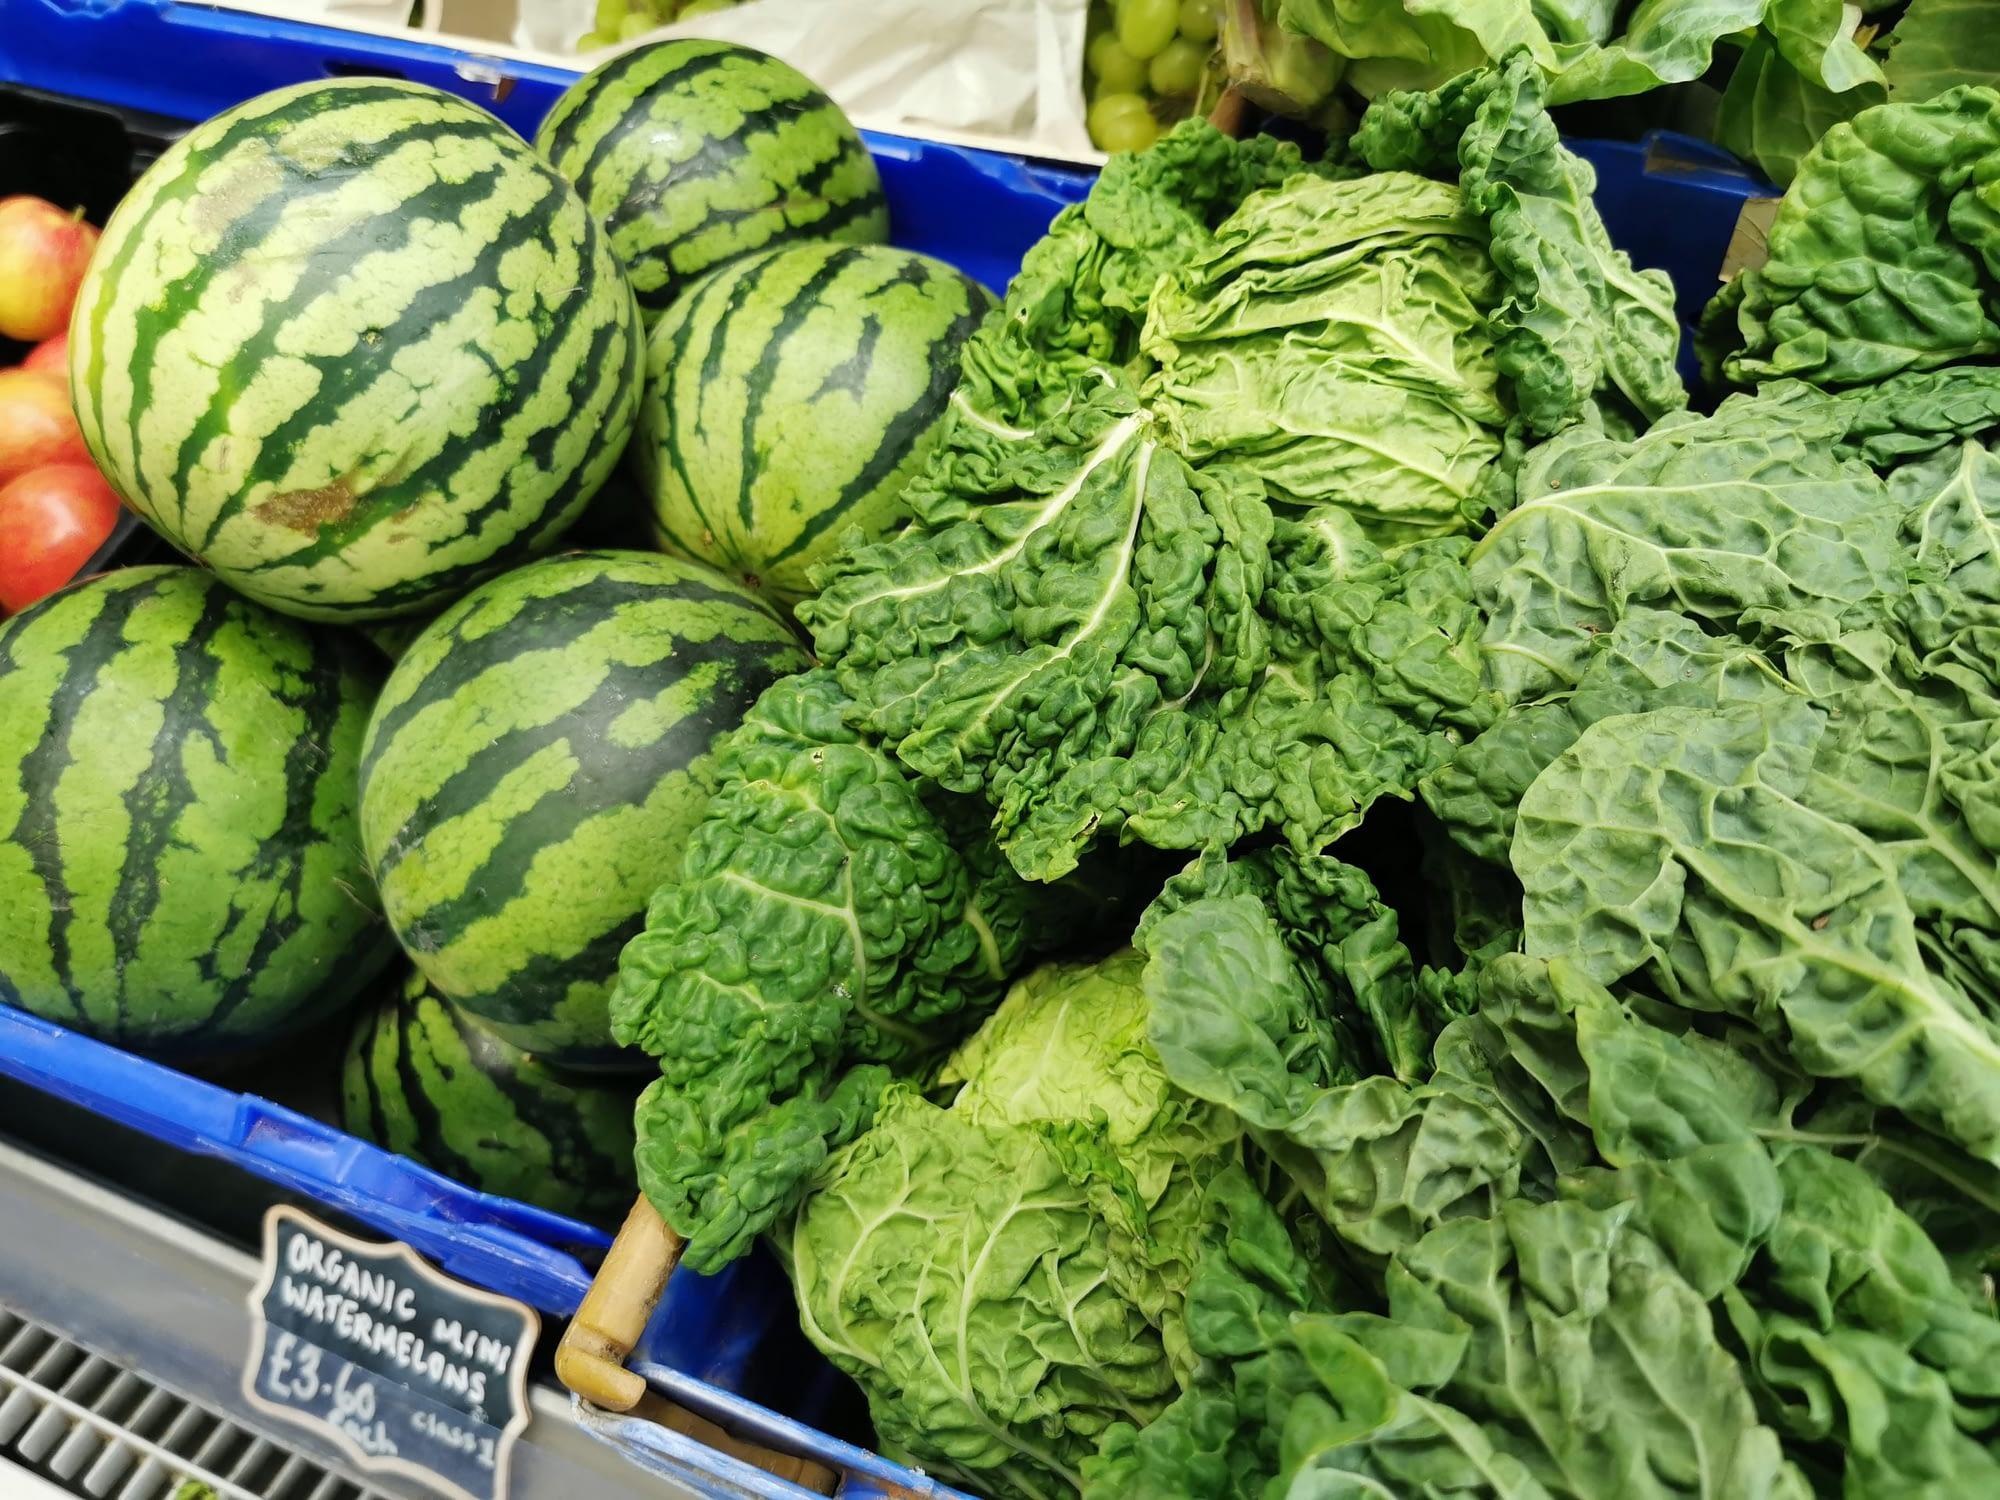 Fresh organic fruit & veg locally grown on organic farms